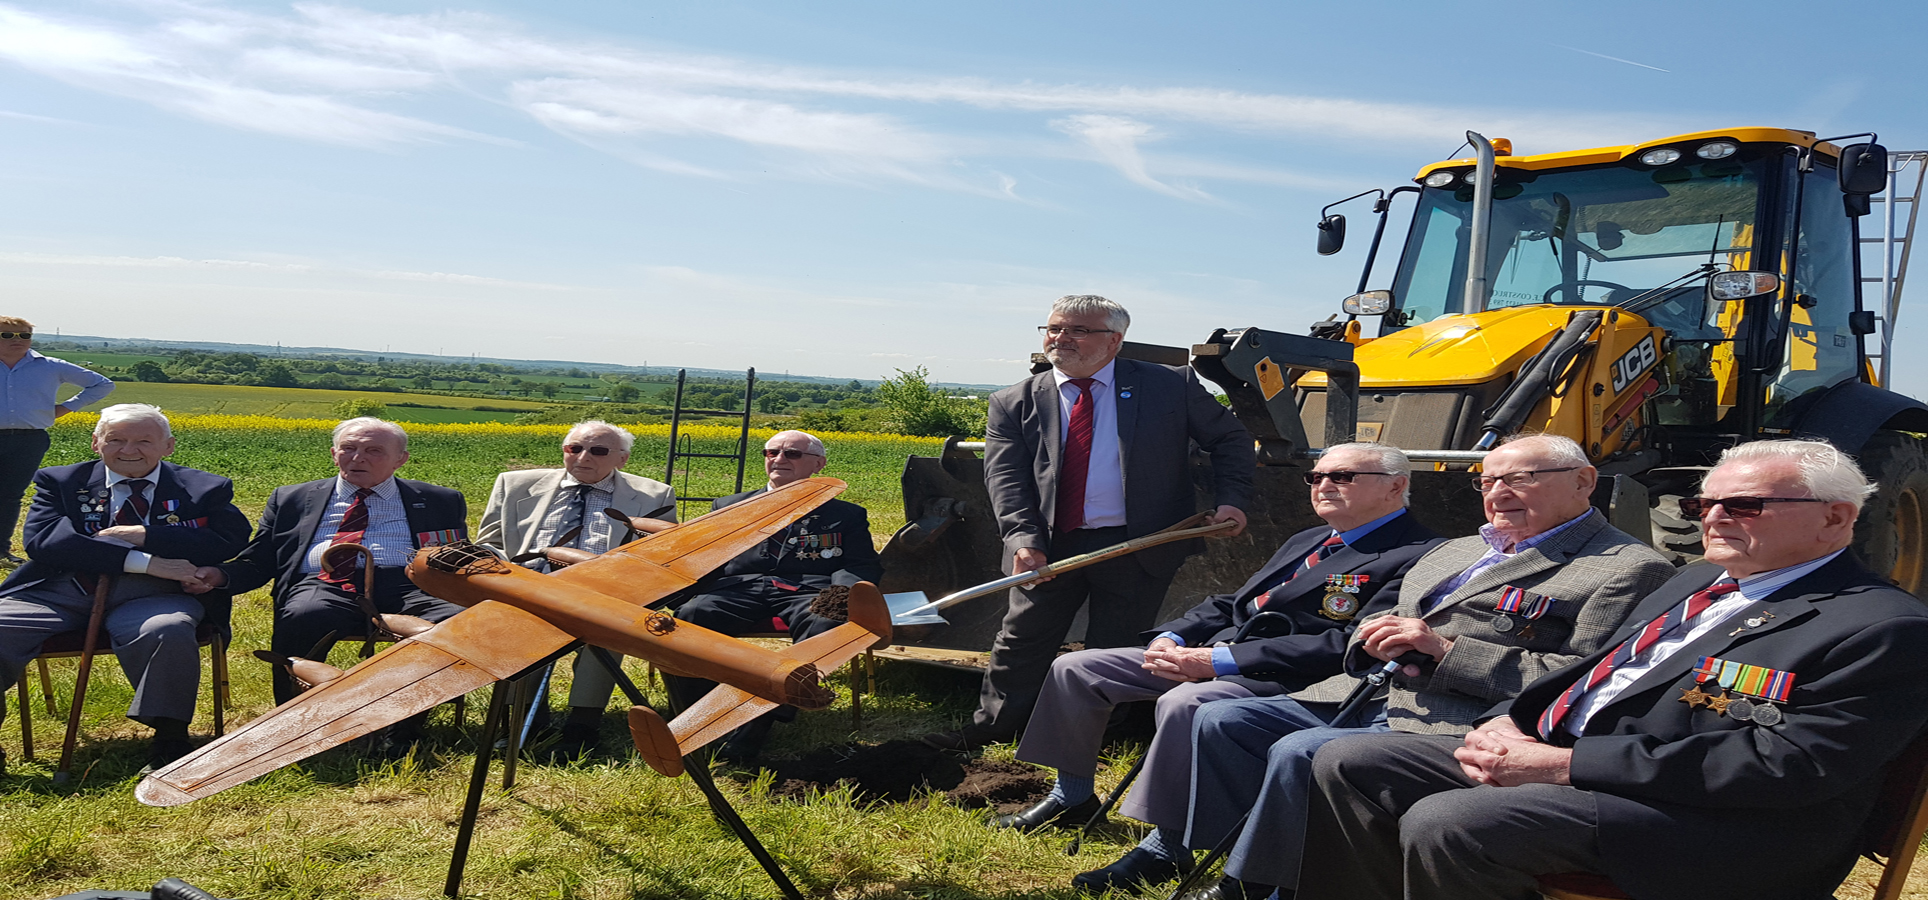 Jessops and BSP on board with Lancaster Bomber sculpture, Jessops Construction Ltd